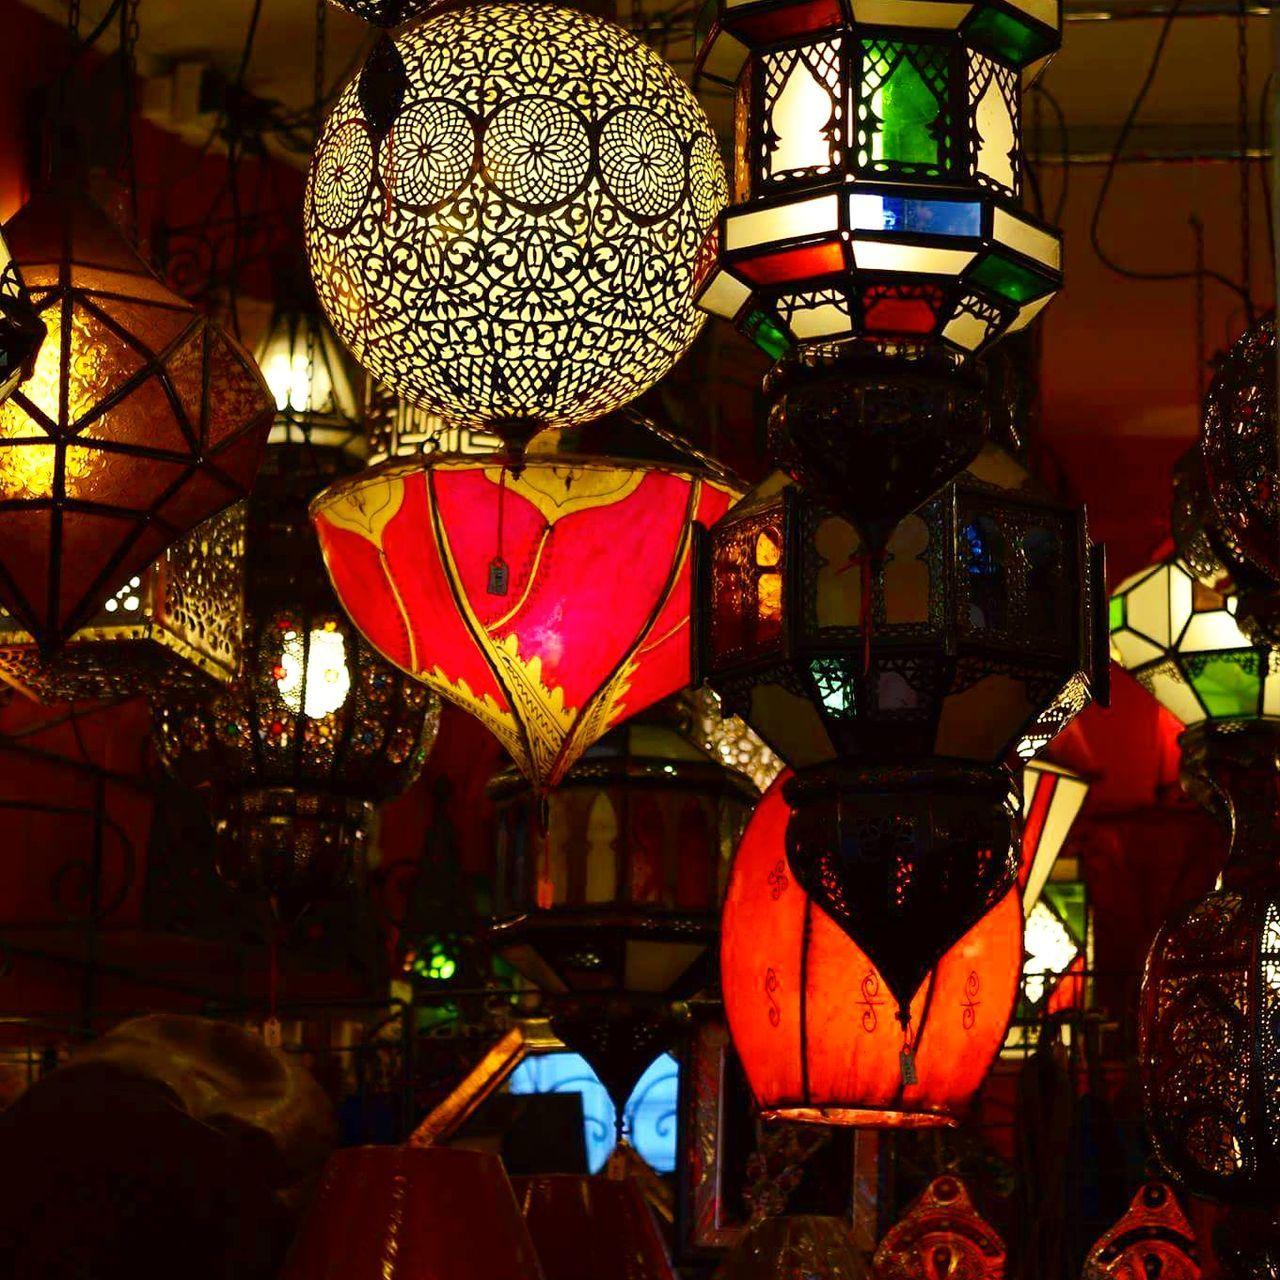 hanging, lantern, night, illuminated, no people, close-up, indoors